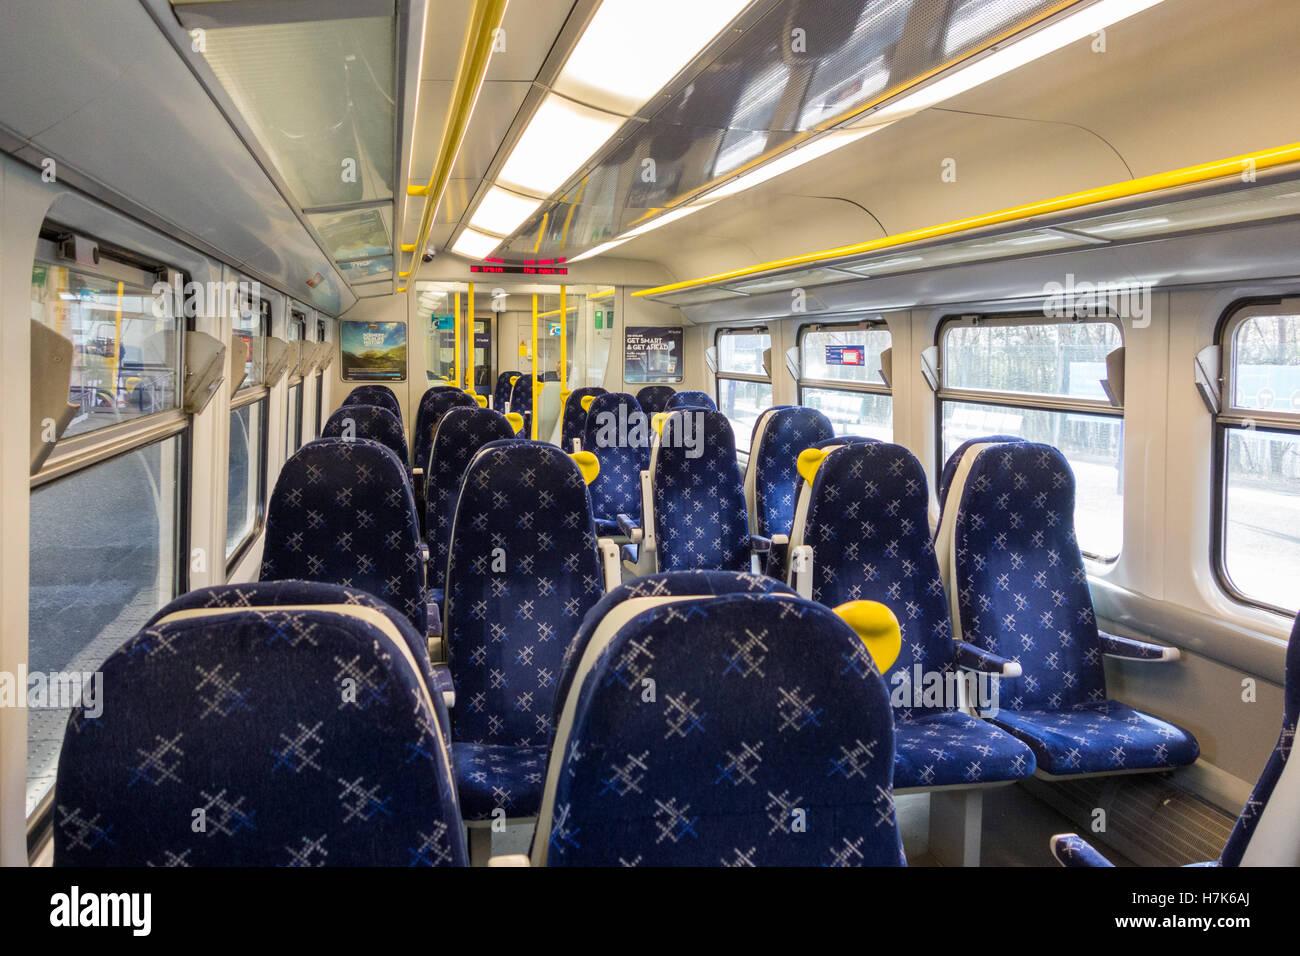 ScotRail train carriage interior, Scotland, UK - Stock Image